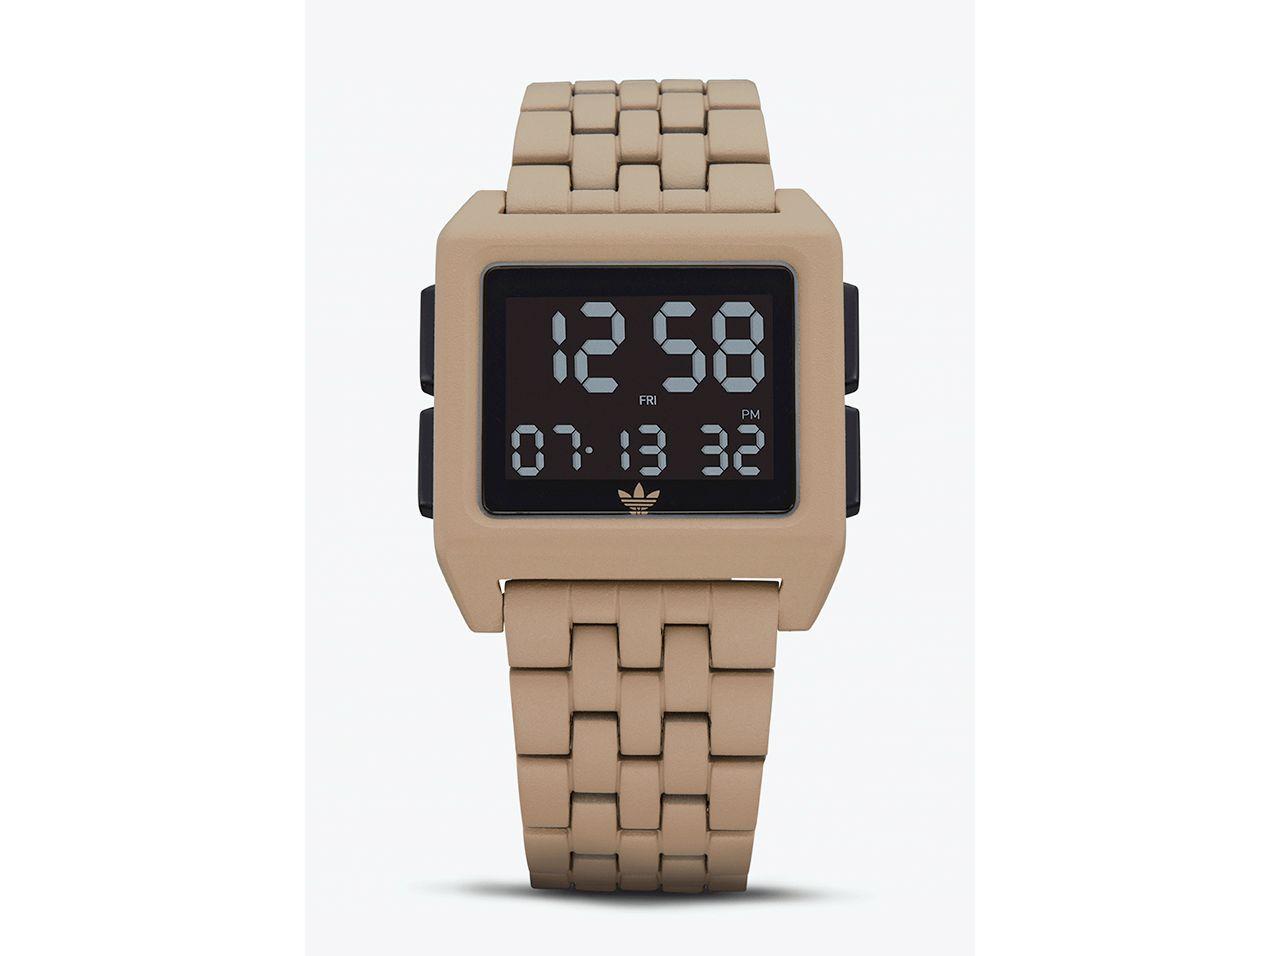 adidas Archive_CM1(Archive_CM1)【アディダス】【メンズファッション】【時計】【腕時計】【ウォッチ】【ストアレビュー記載でソックスプレゼント対象品】